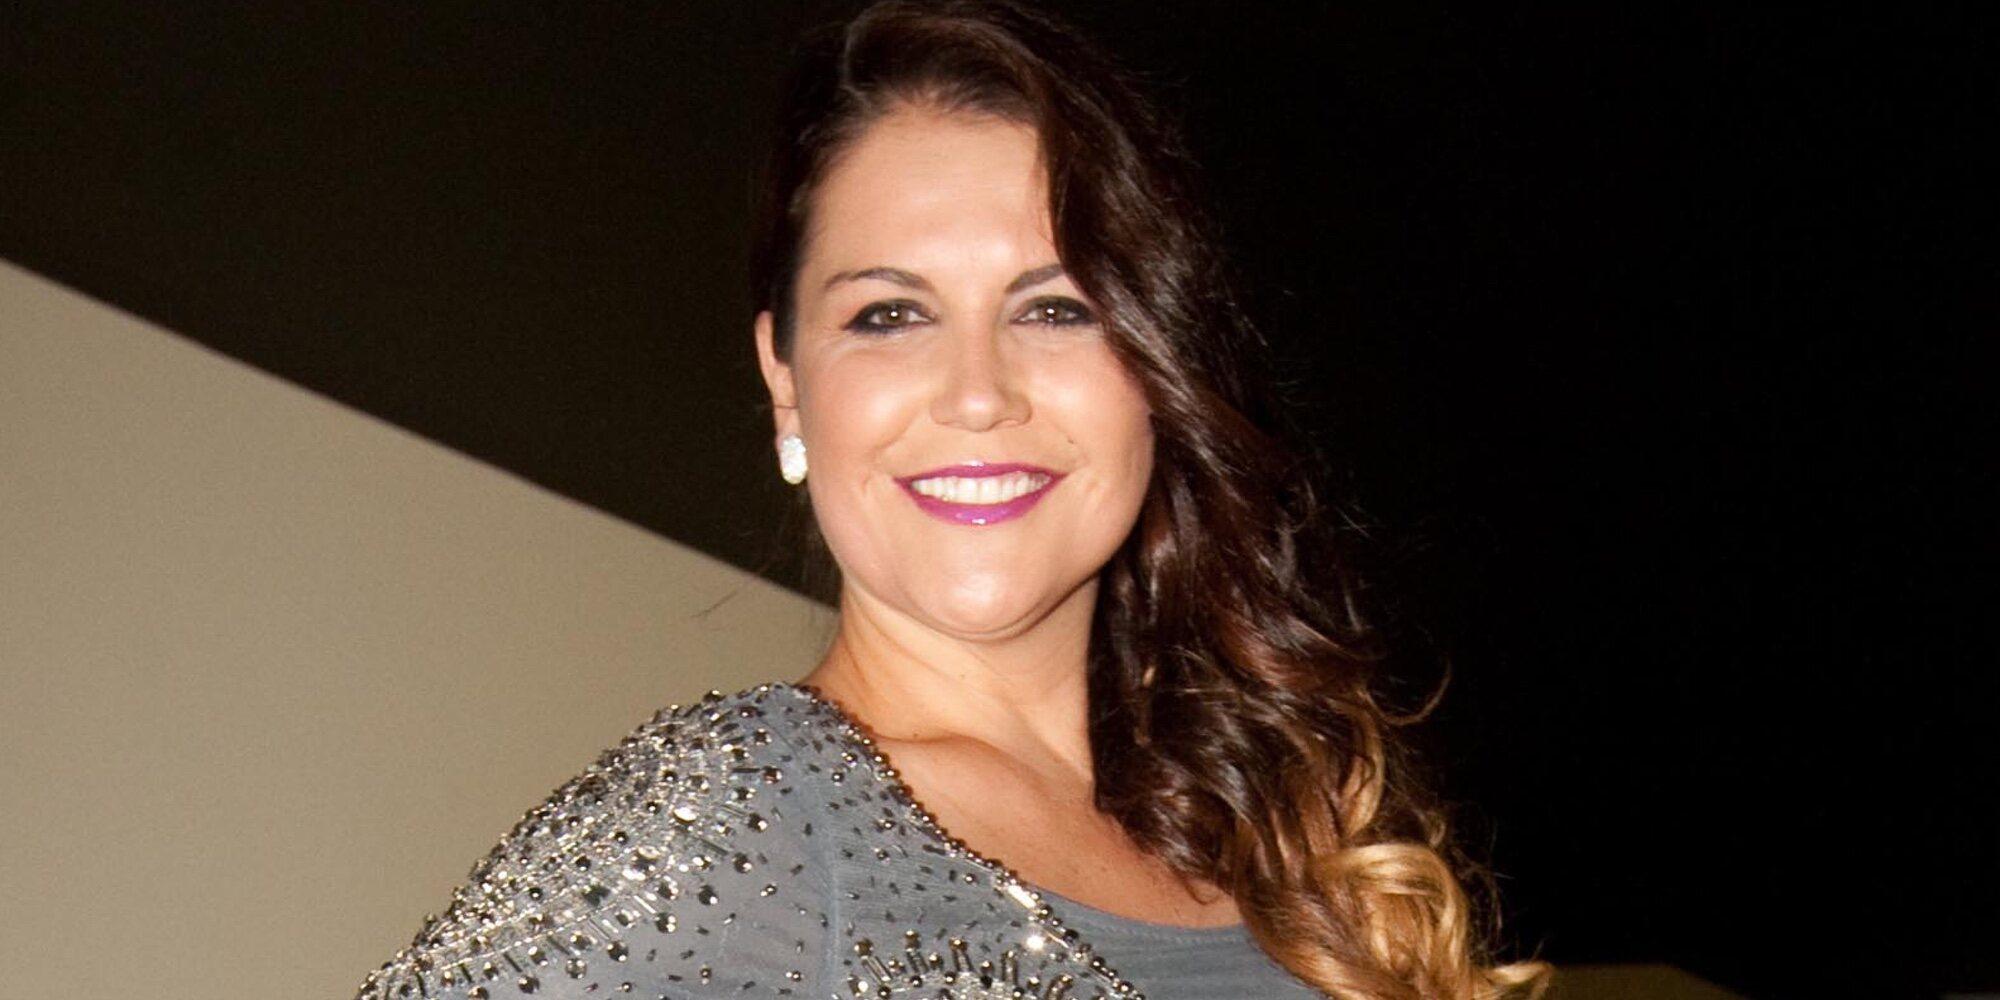 Katia Aveiro, la hermana de Cristiano Ronaldo, ingresada por coronavirus tras ser negacionista